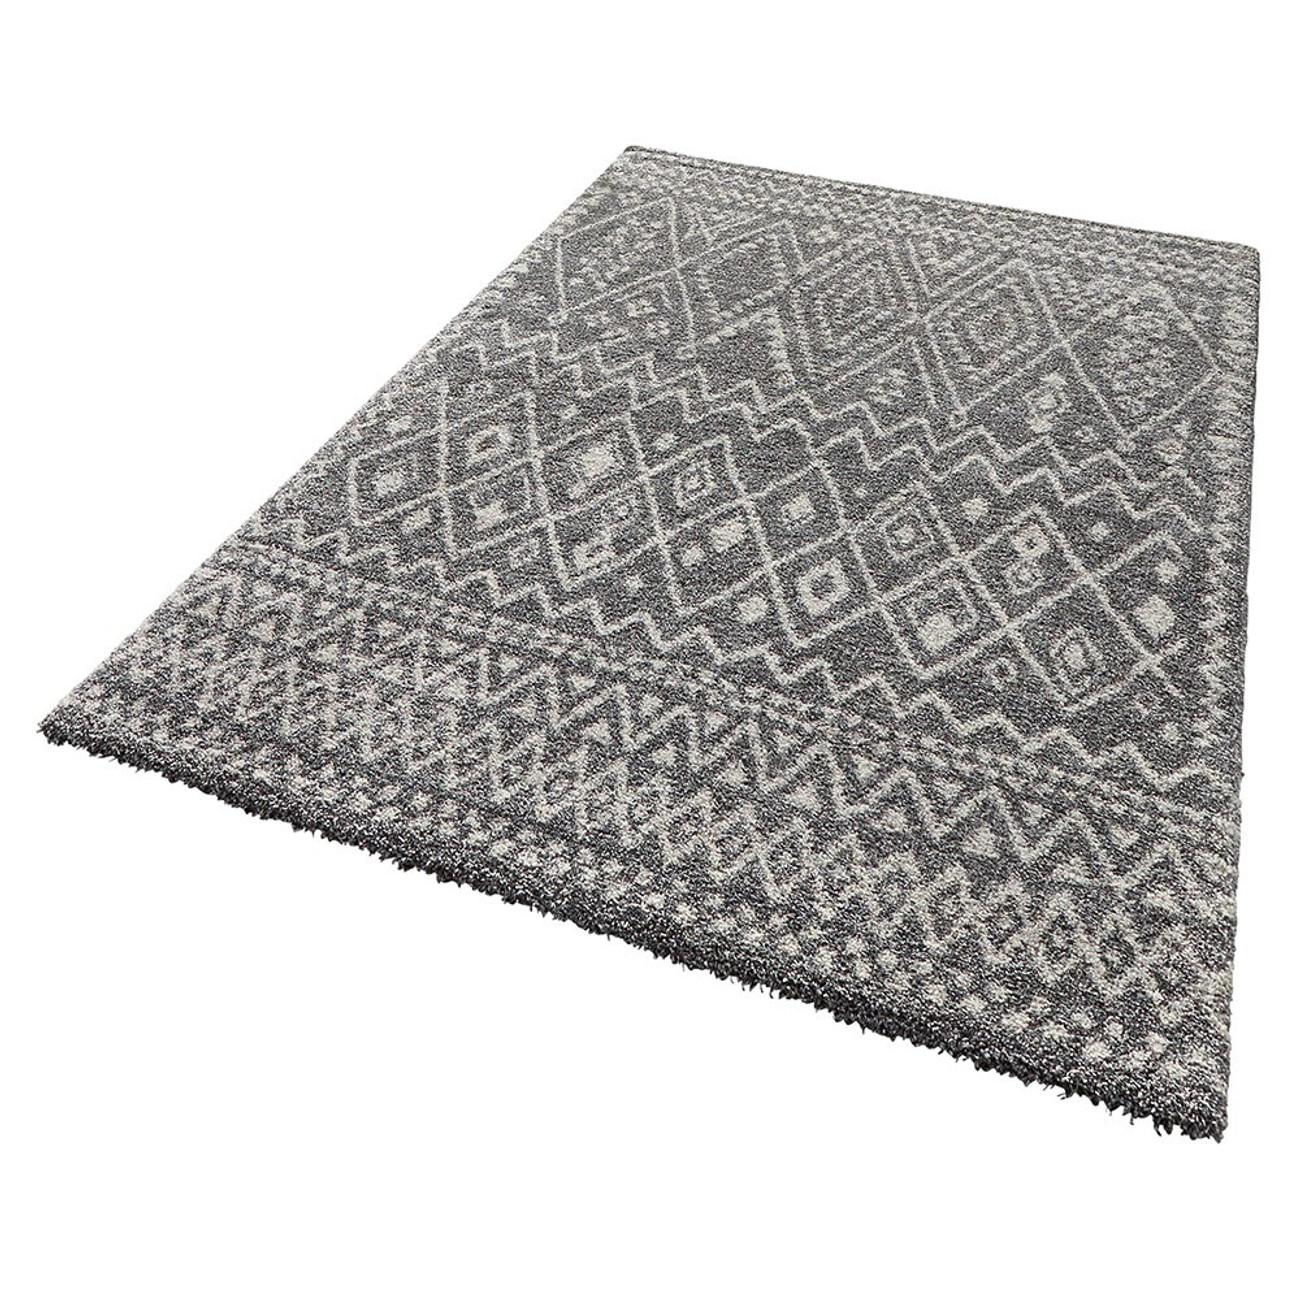 design teppich hochflor langflor inka gemustert grau teppiche hochflor teppiche. Black Bedroom Furniture Sets. Home Design Ideas